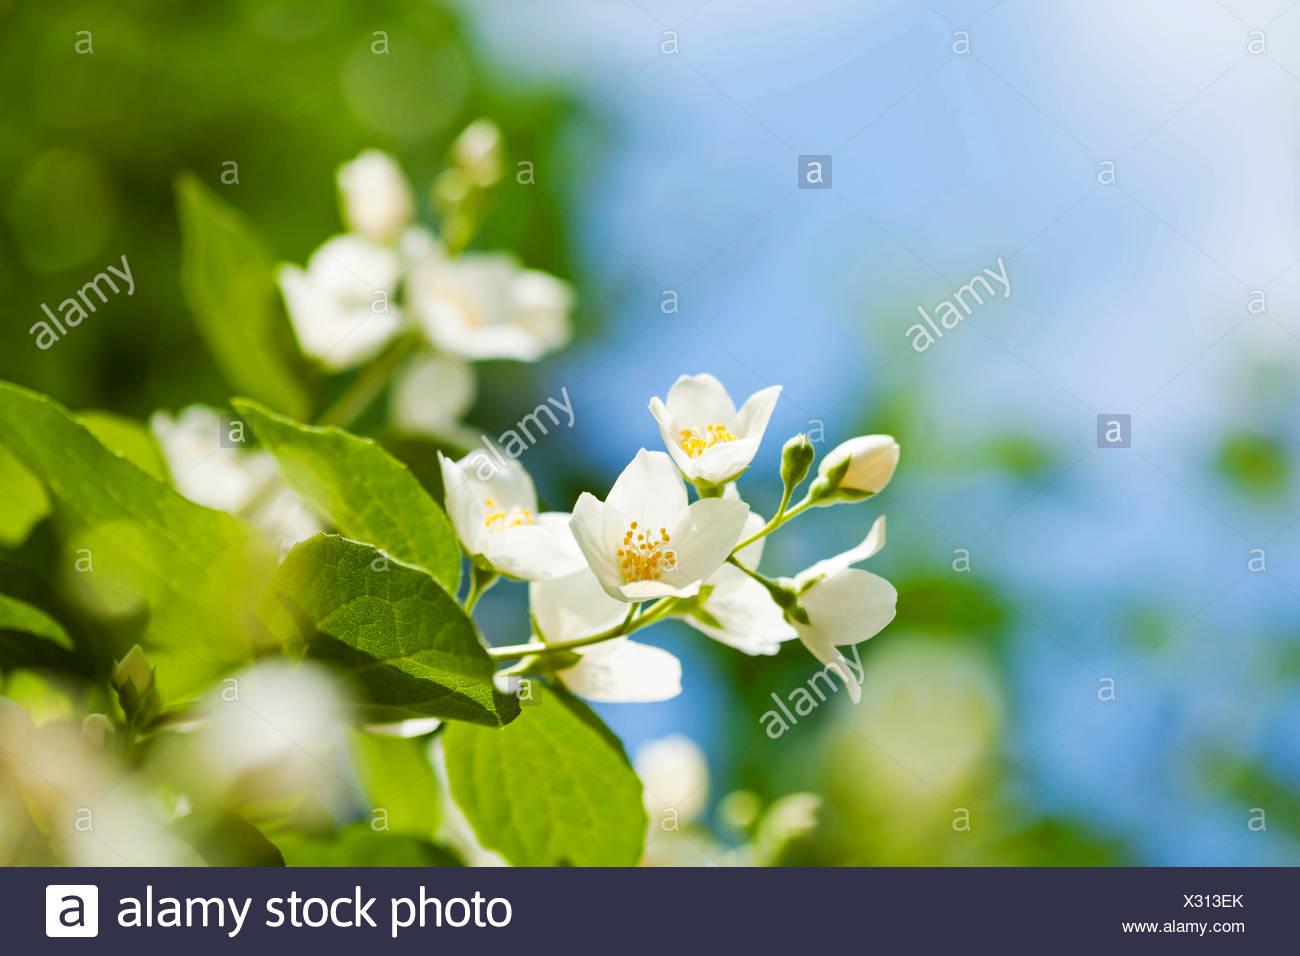 Beautiful fresh jasmine flowers in the garden, macro photography - Stock Image